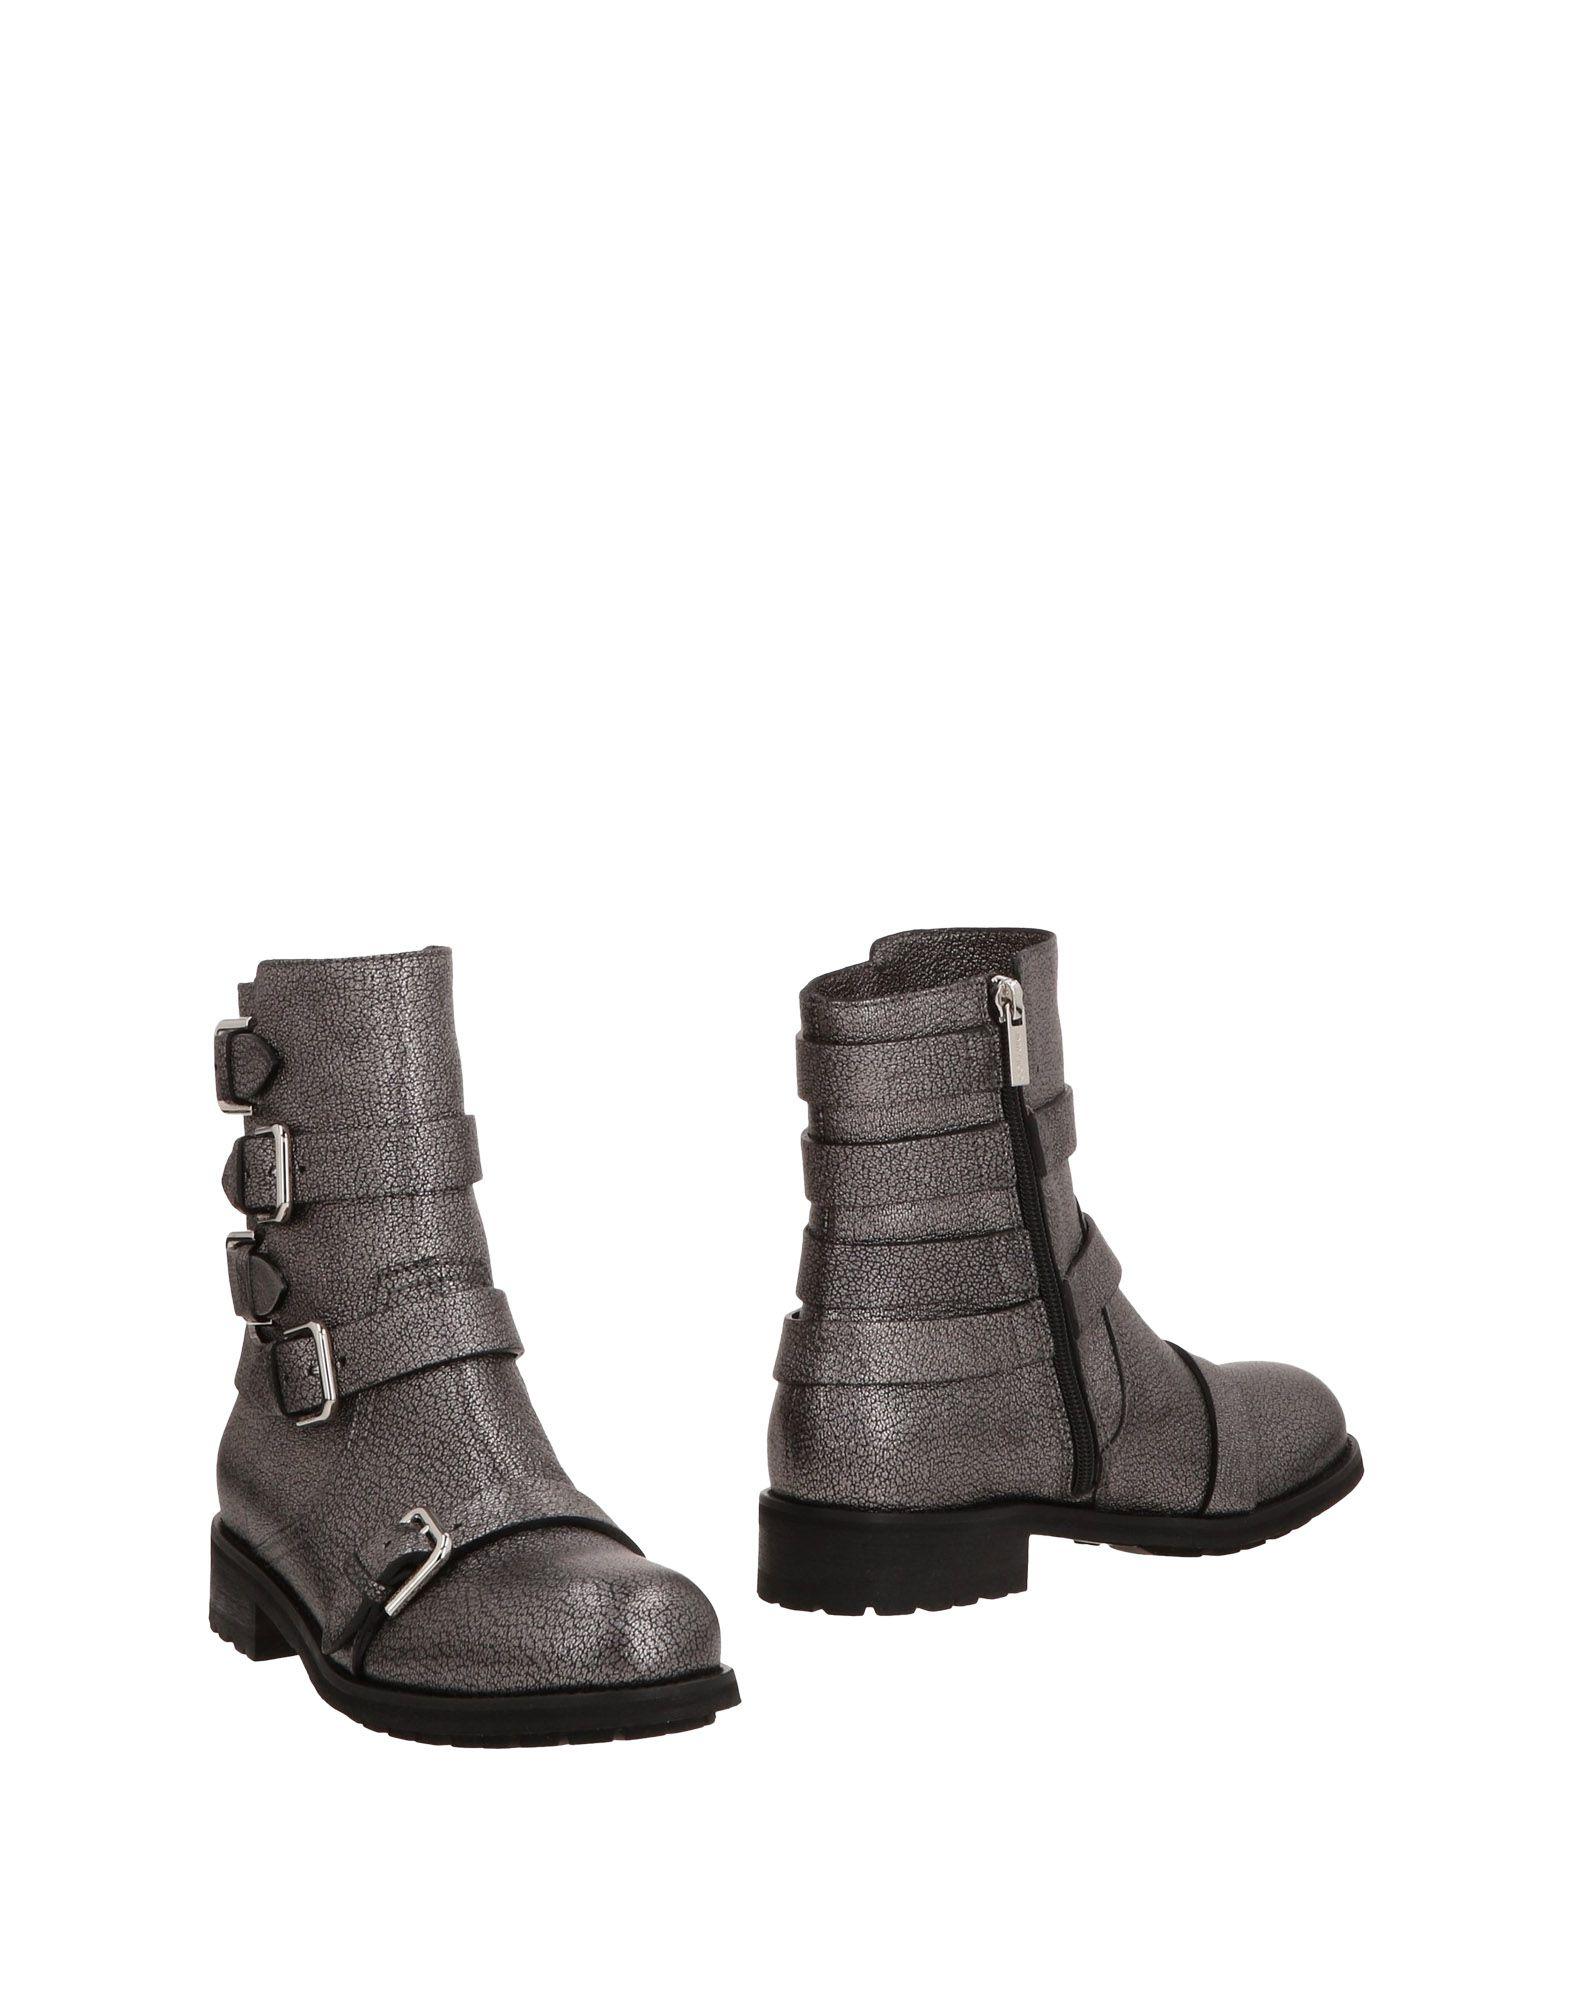 Jimmy Choo Stiefelette Damen  Schuhe 11474125PBGünstige gut aussehende Schuhe  1dc603